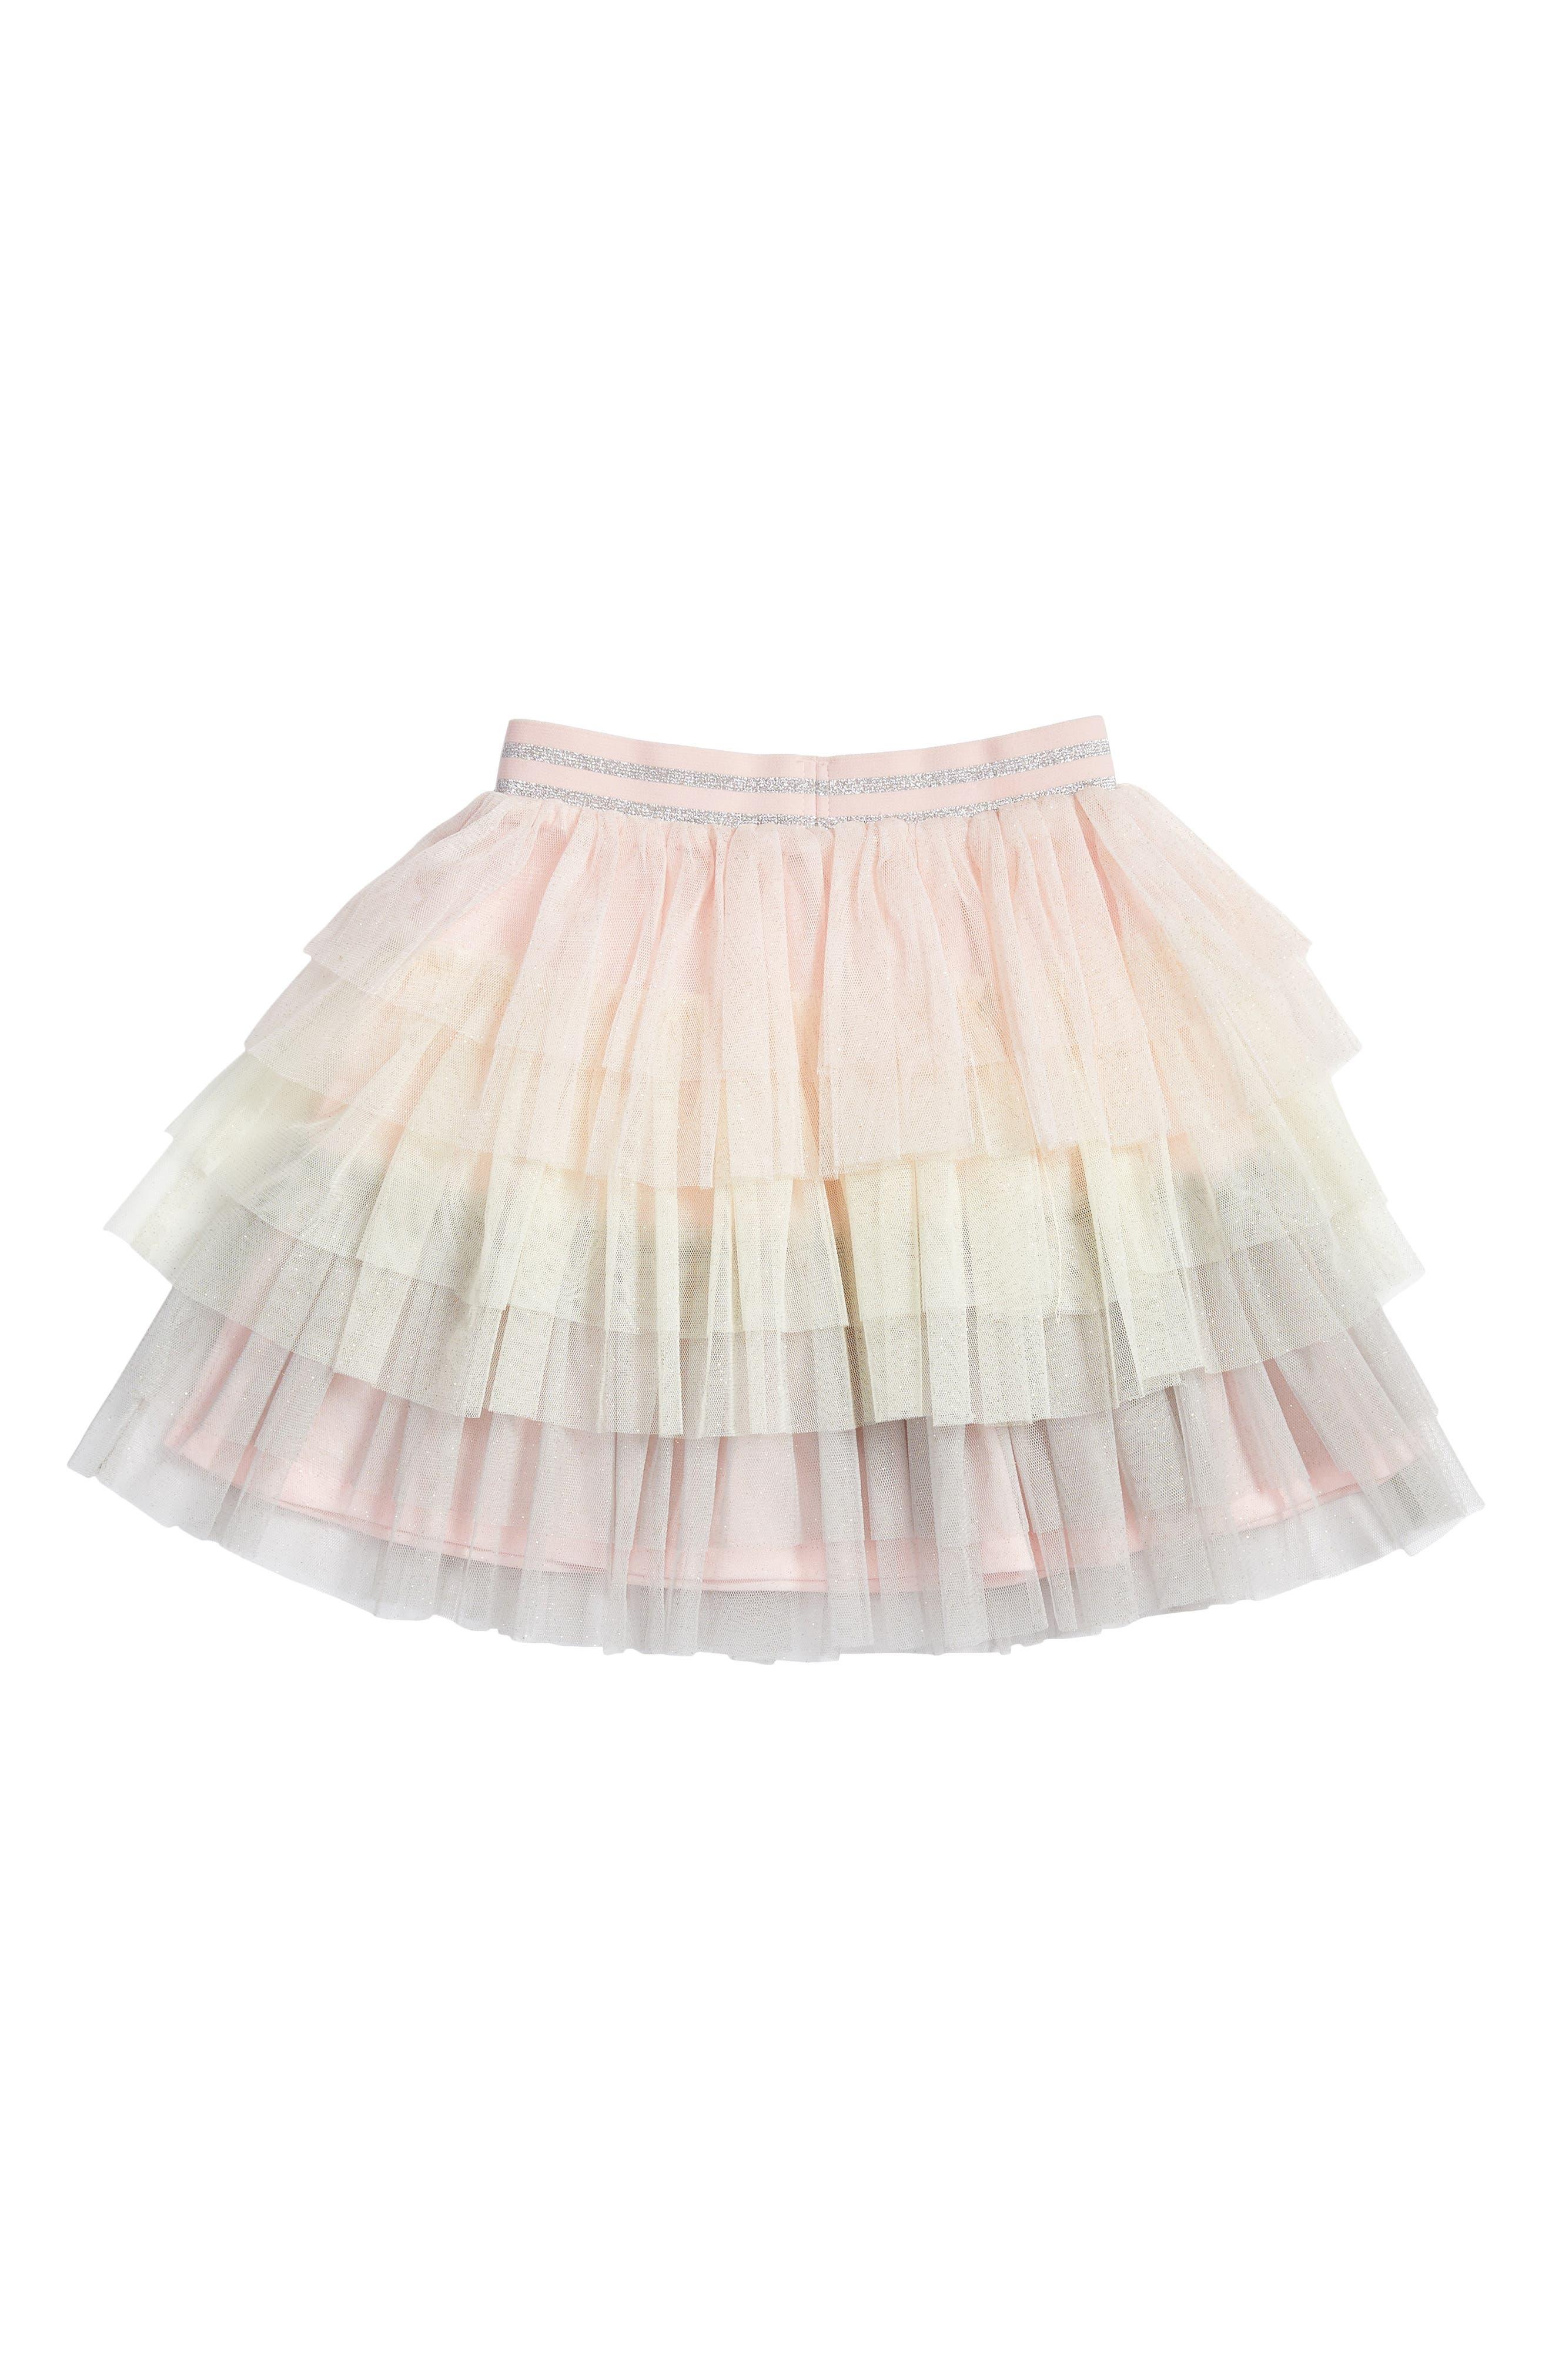 Tiered Tutu Skirt,                             Alternate thumbnail 4, color,                             Pink Multi